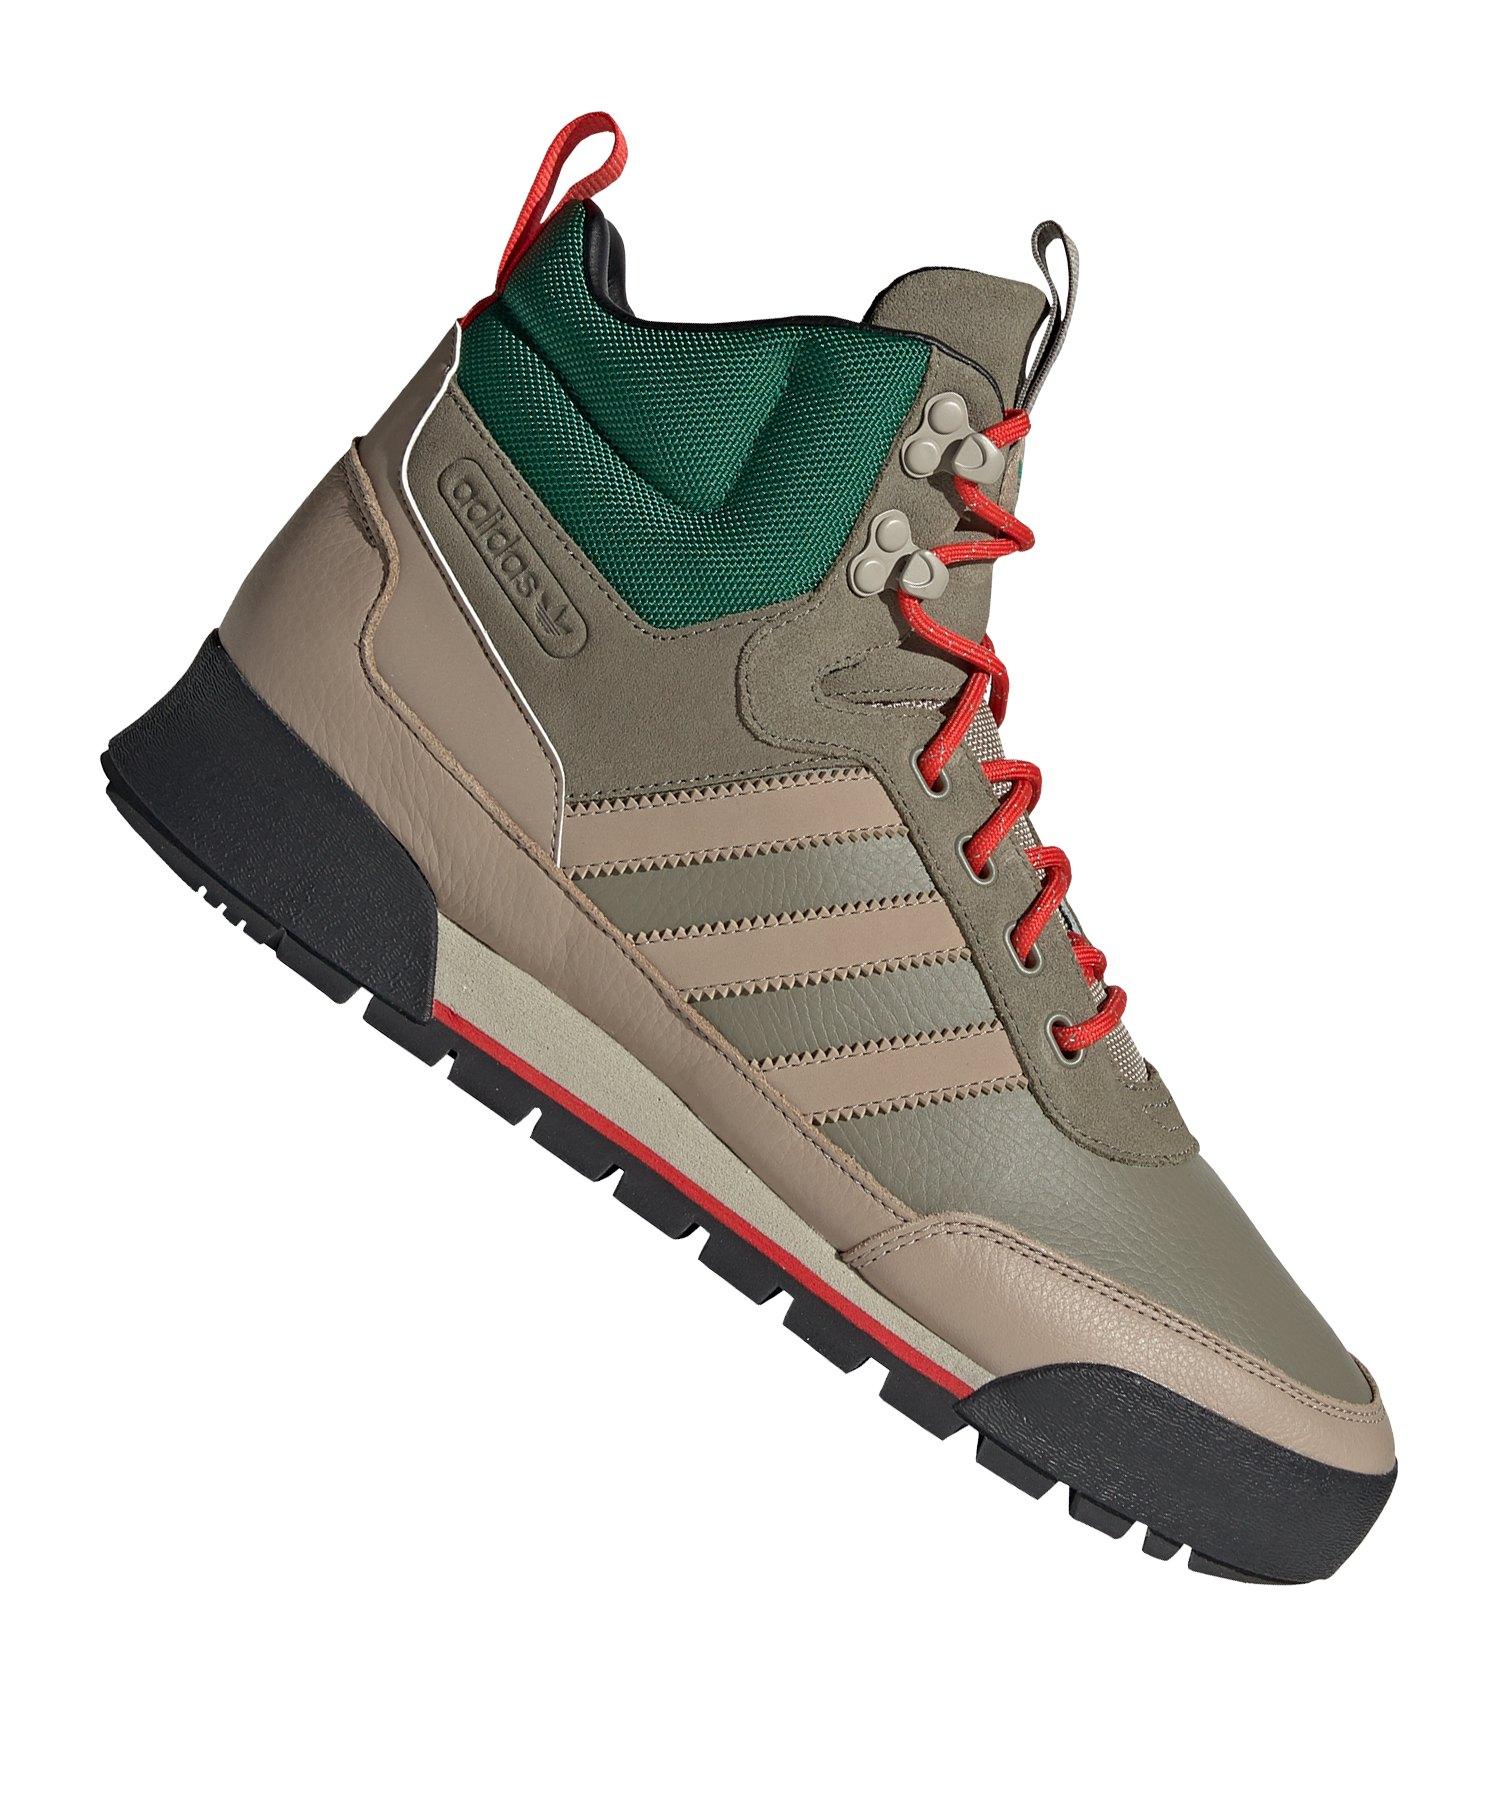 Adidas Sneaker grau braune Sohle us 7,5 40